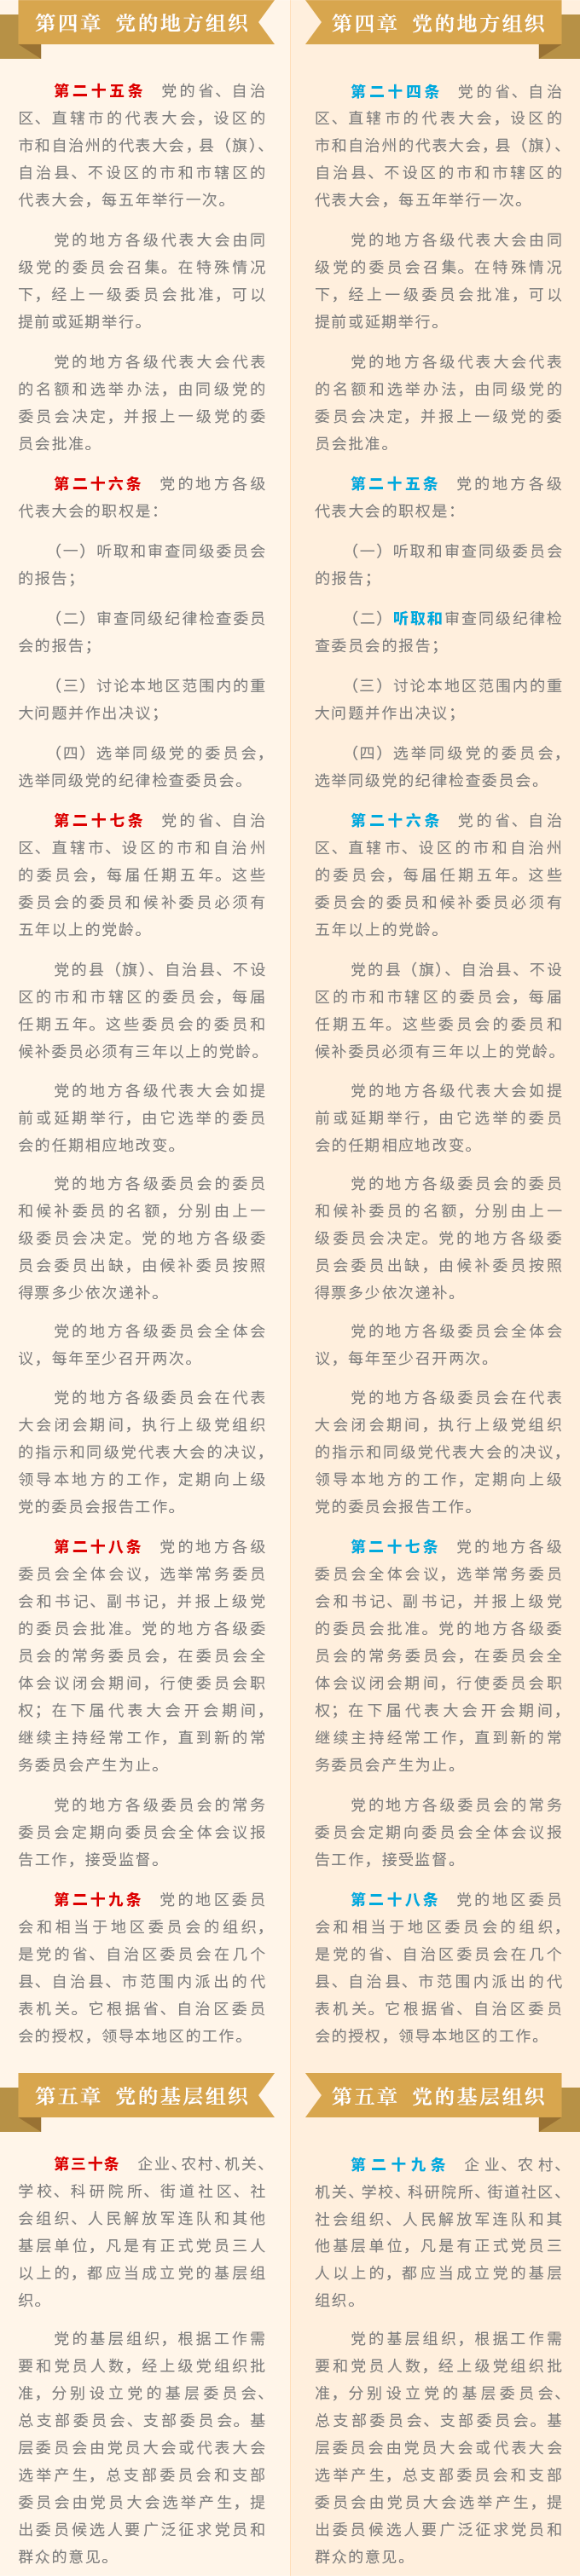 http://www.ccdi.gov.cn/yw/201710/W020171031664657858667.png